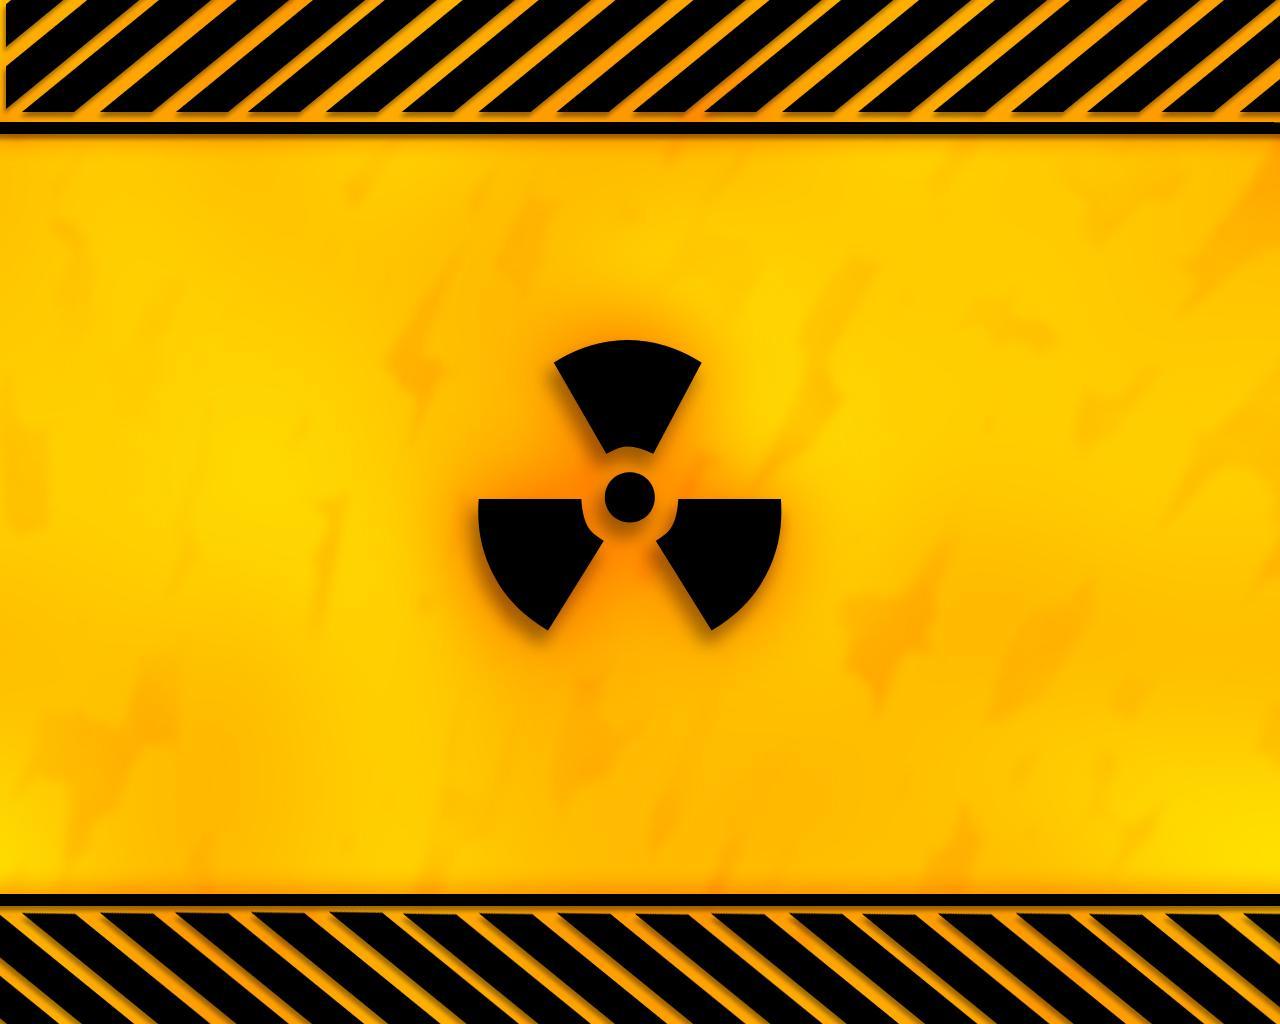 ¡Peligro: Contaminación!